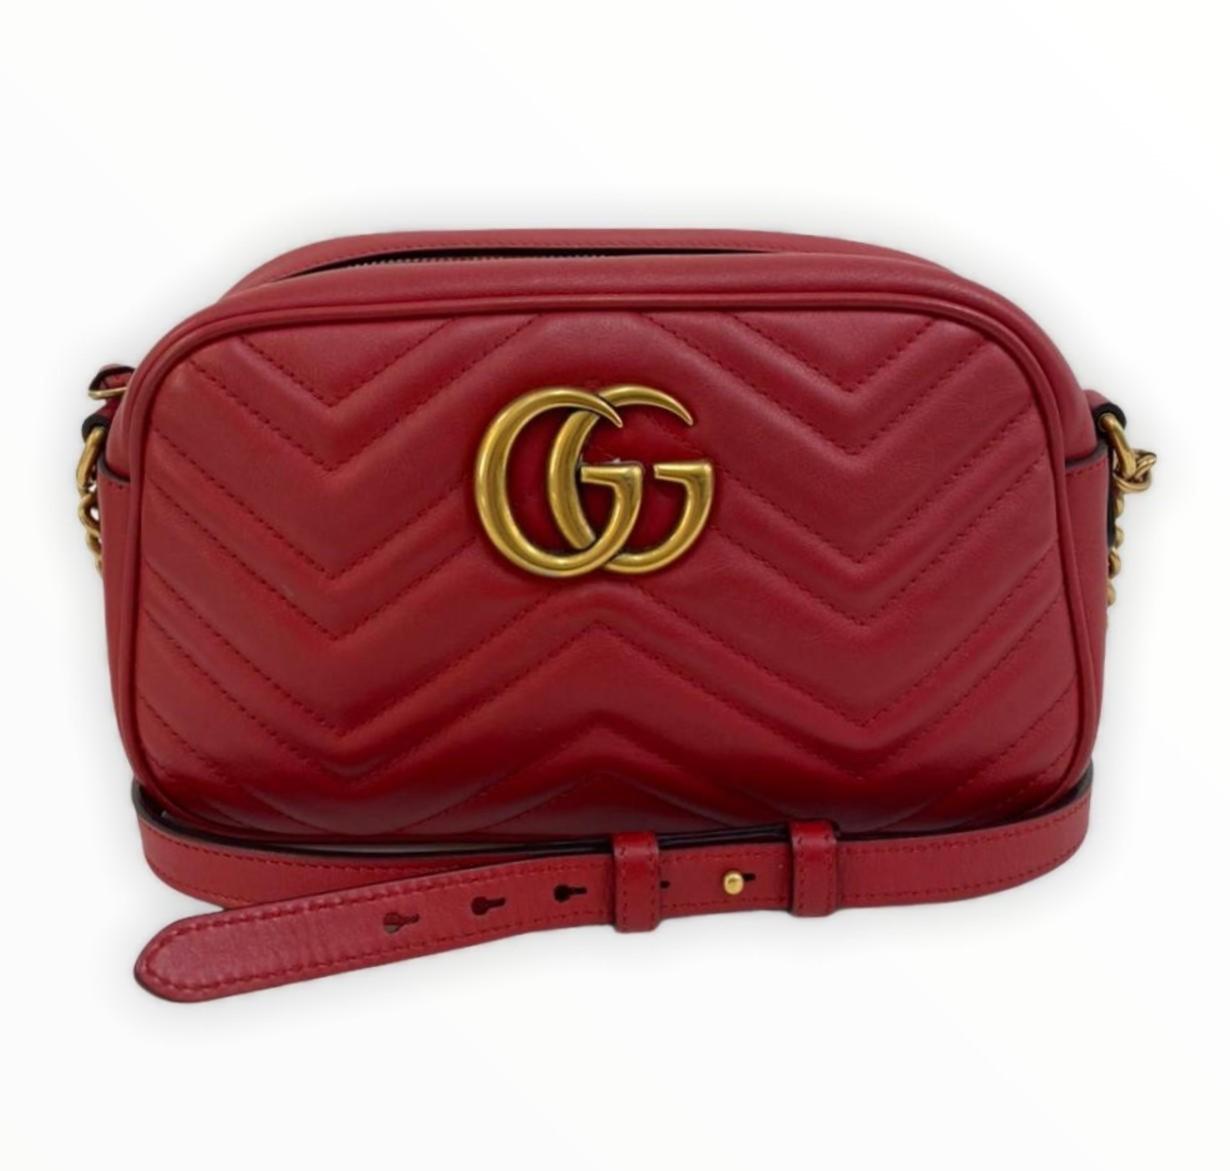 Bolsa Gucci GG Marmont Vermelha